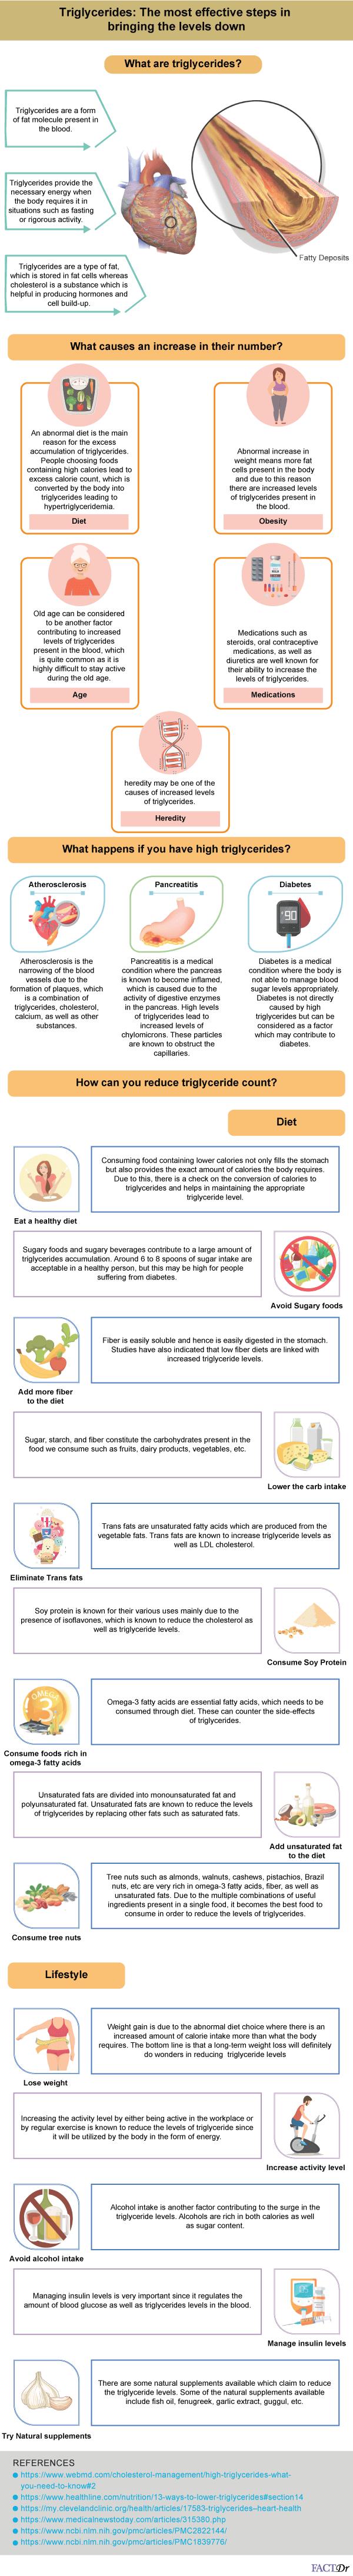 triglycerides infographic